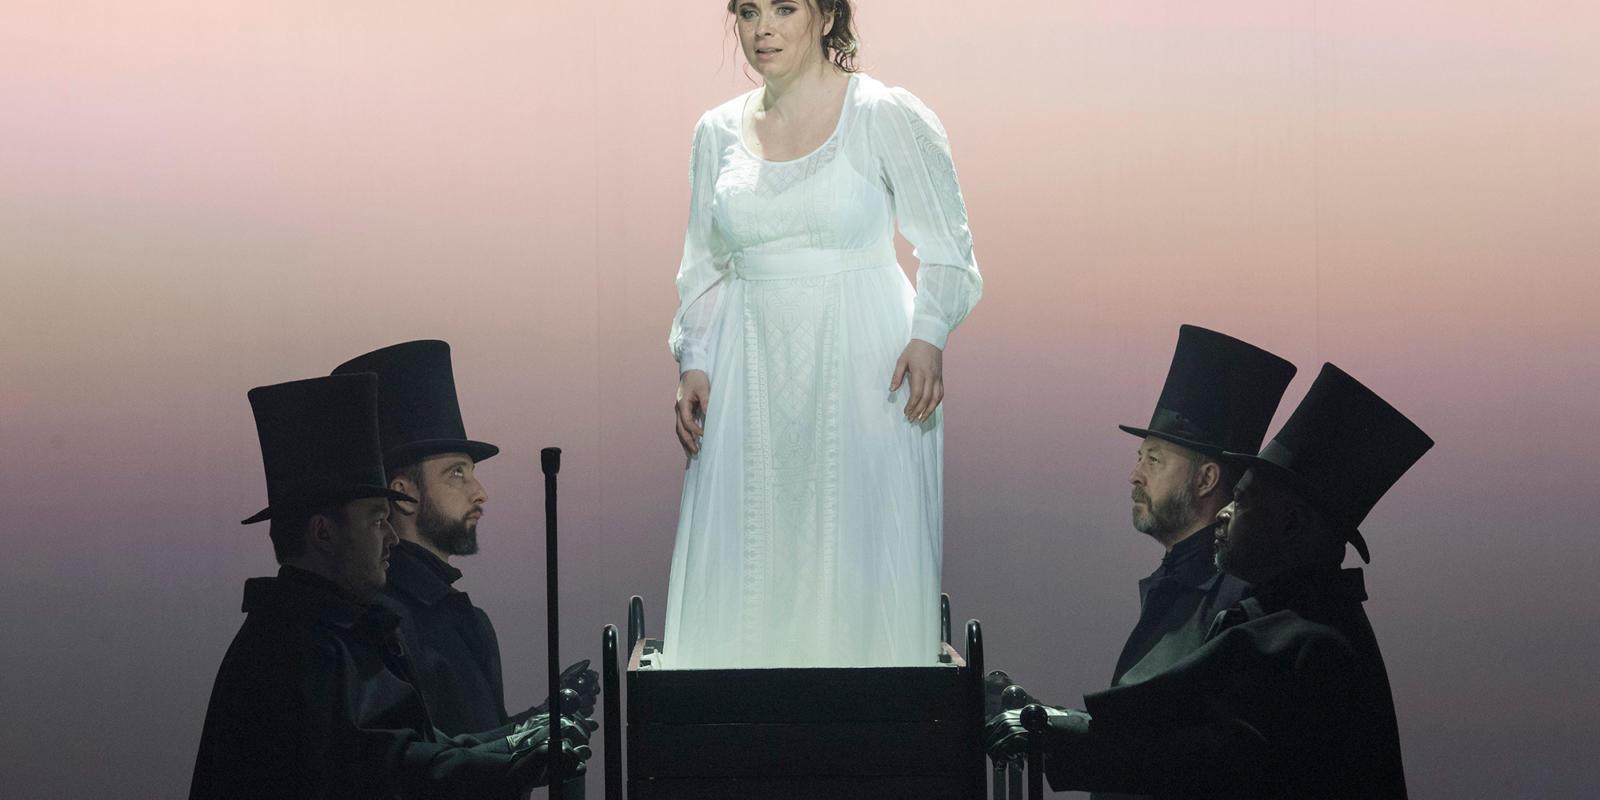 ENO 2018/19 Jack the Ripper: The Women of Whitechapel: Natalya Romaniw as Mary Jane Kelly © Alastair Muir